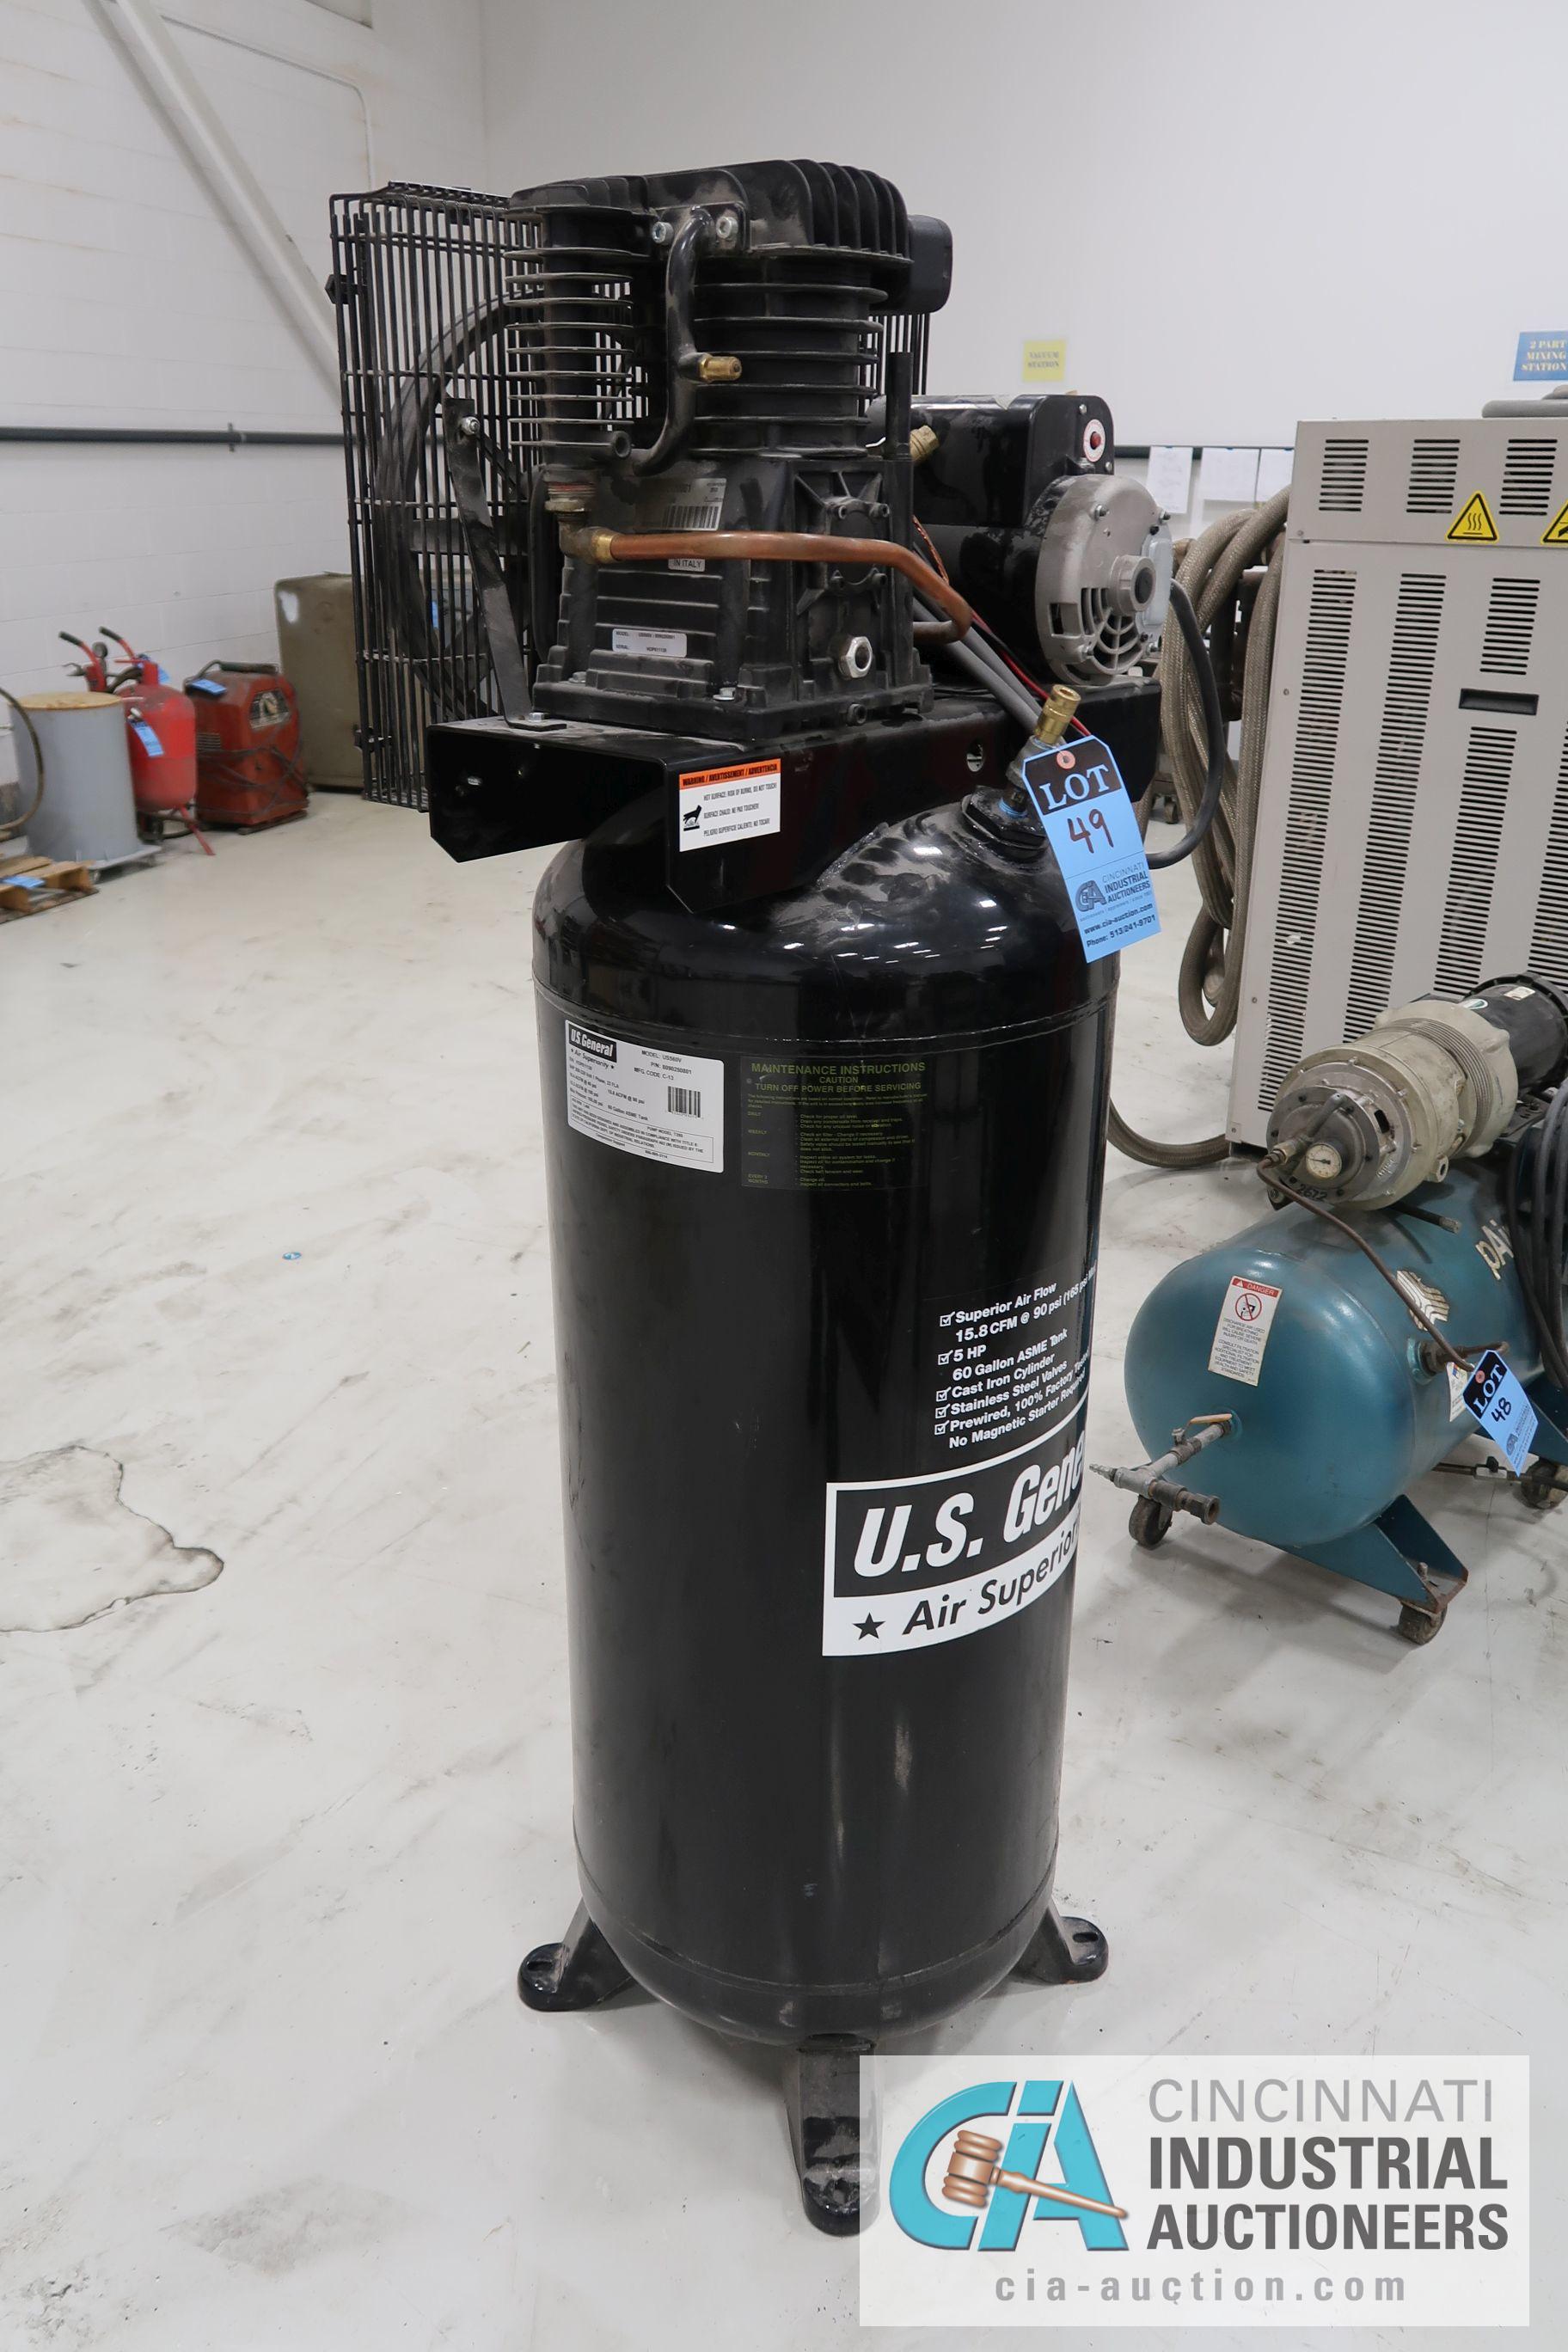 5 HP US GENERAL HORIZONTAL TANK MOUNTED AIR COMPRESSOR, 60 GAL. TANK, 230 VOLT - Image 2 of 4